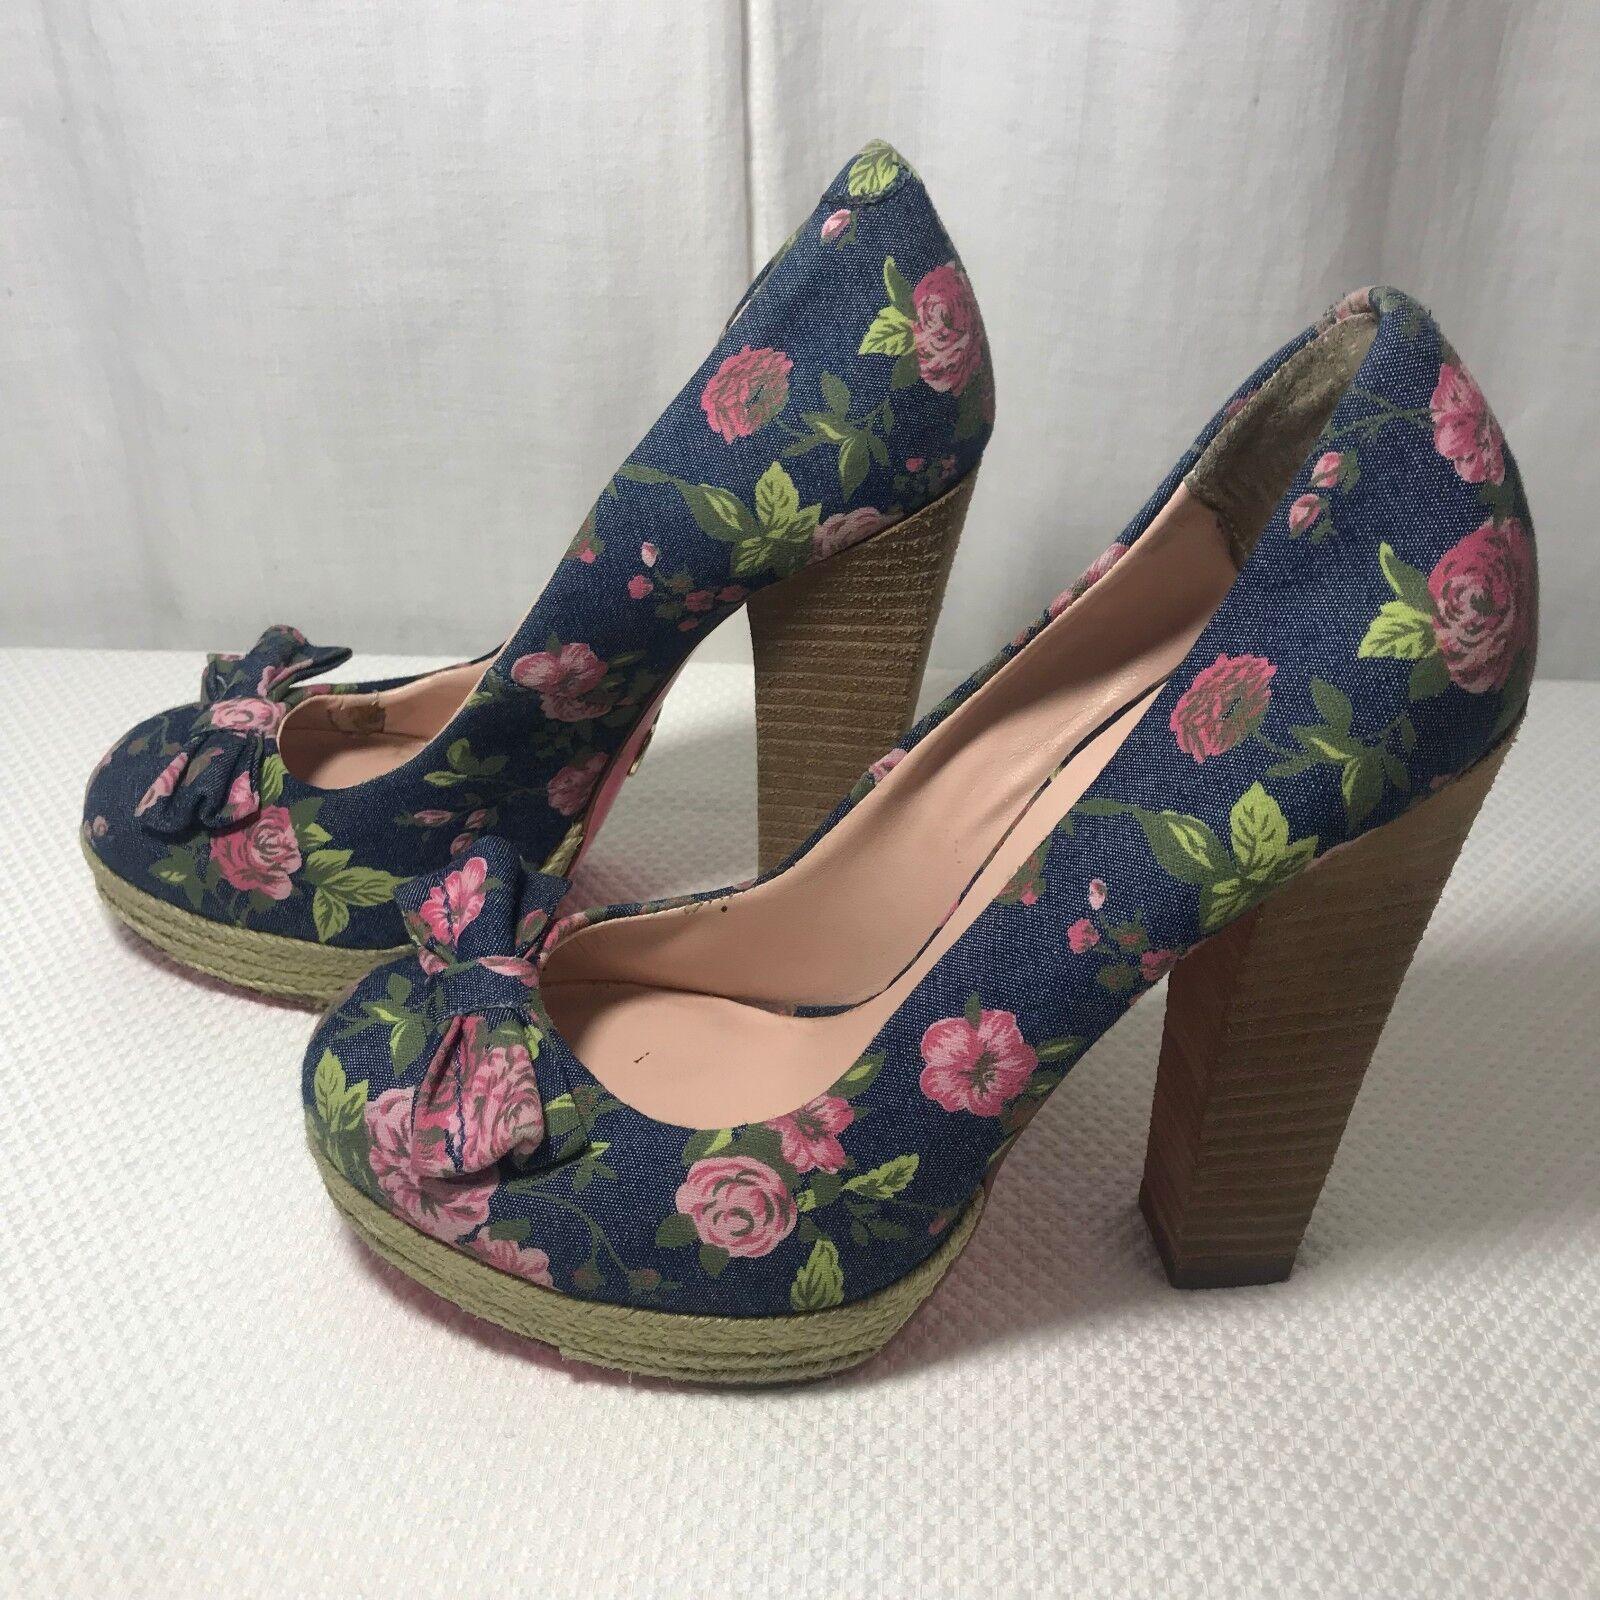 Betsey Johnson Maggi 7 Denim Floral High Heel Platform Pumps shoes Espadrilles